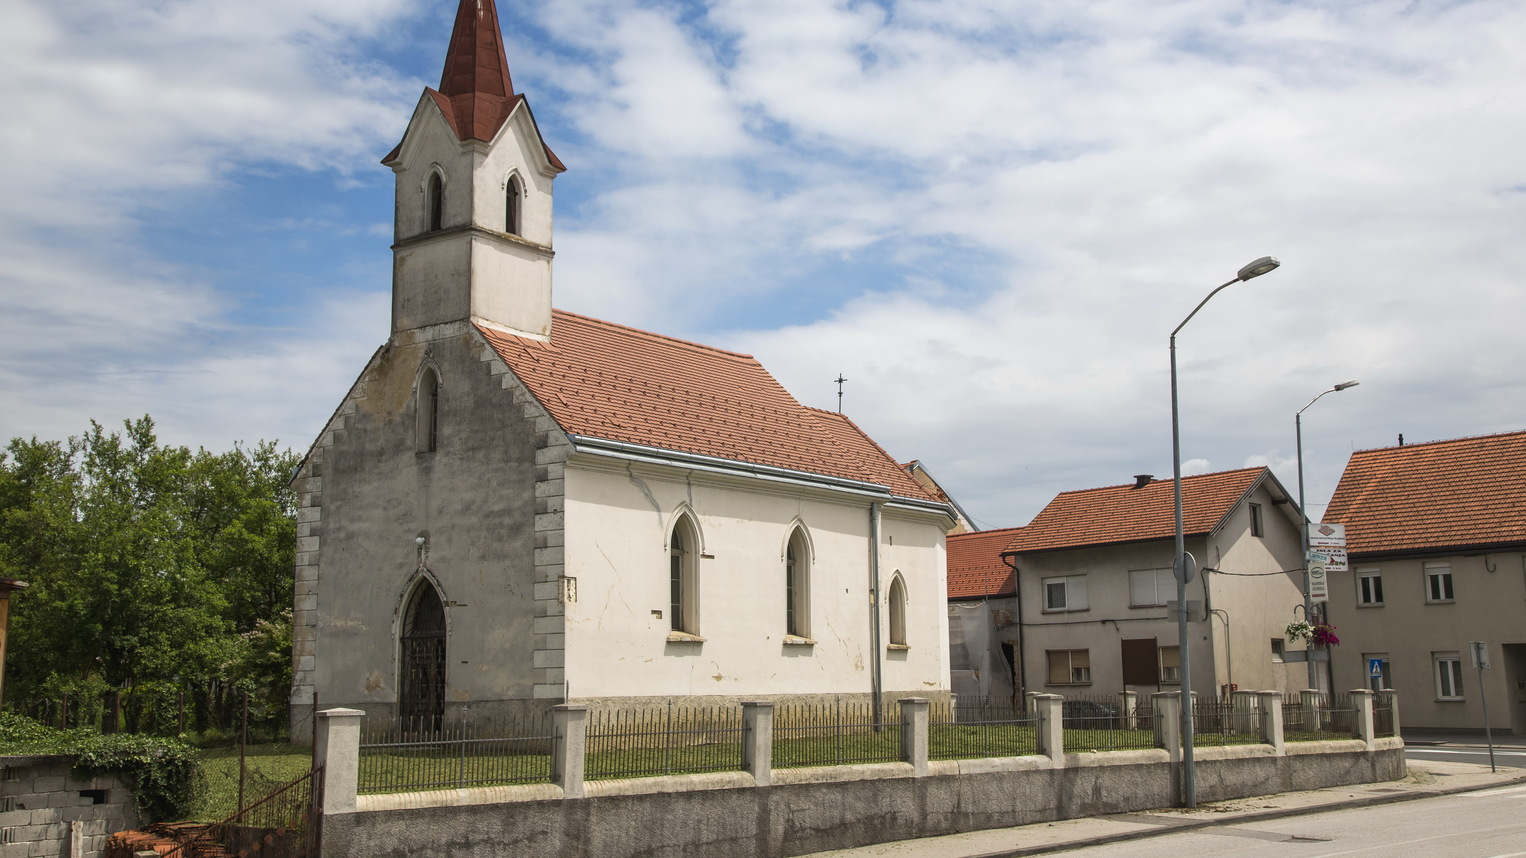 Kapela svetog Duha, Jastrebarsko